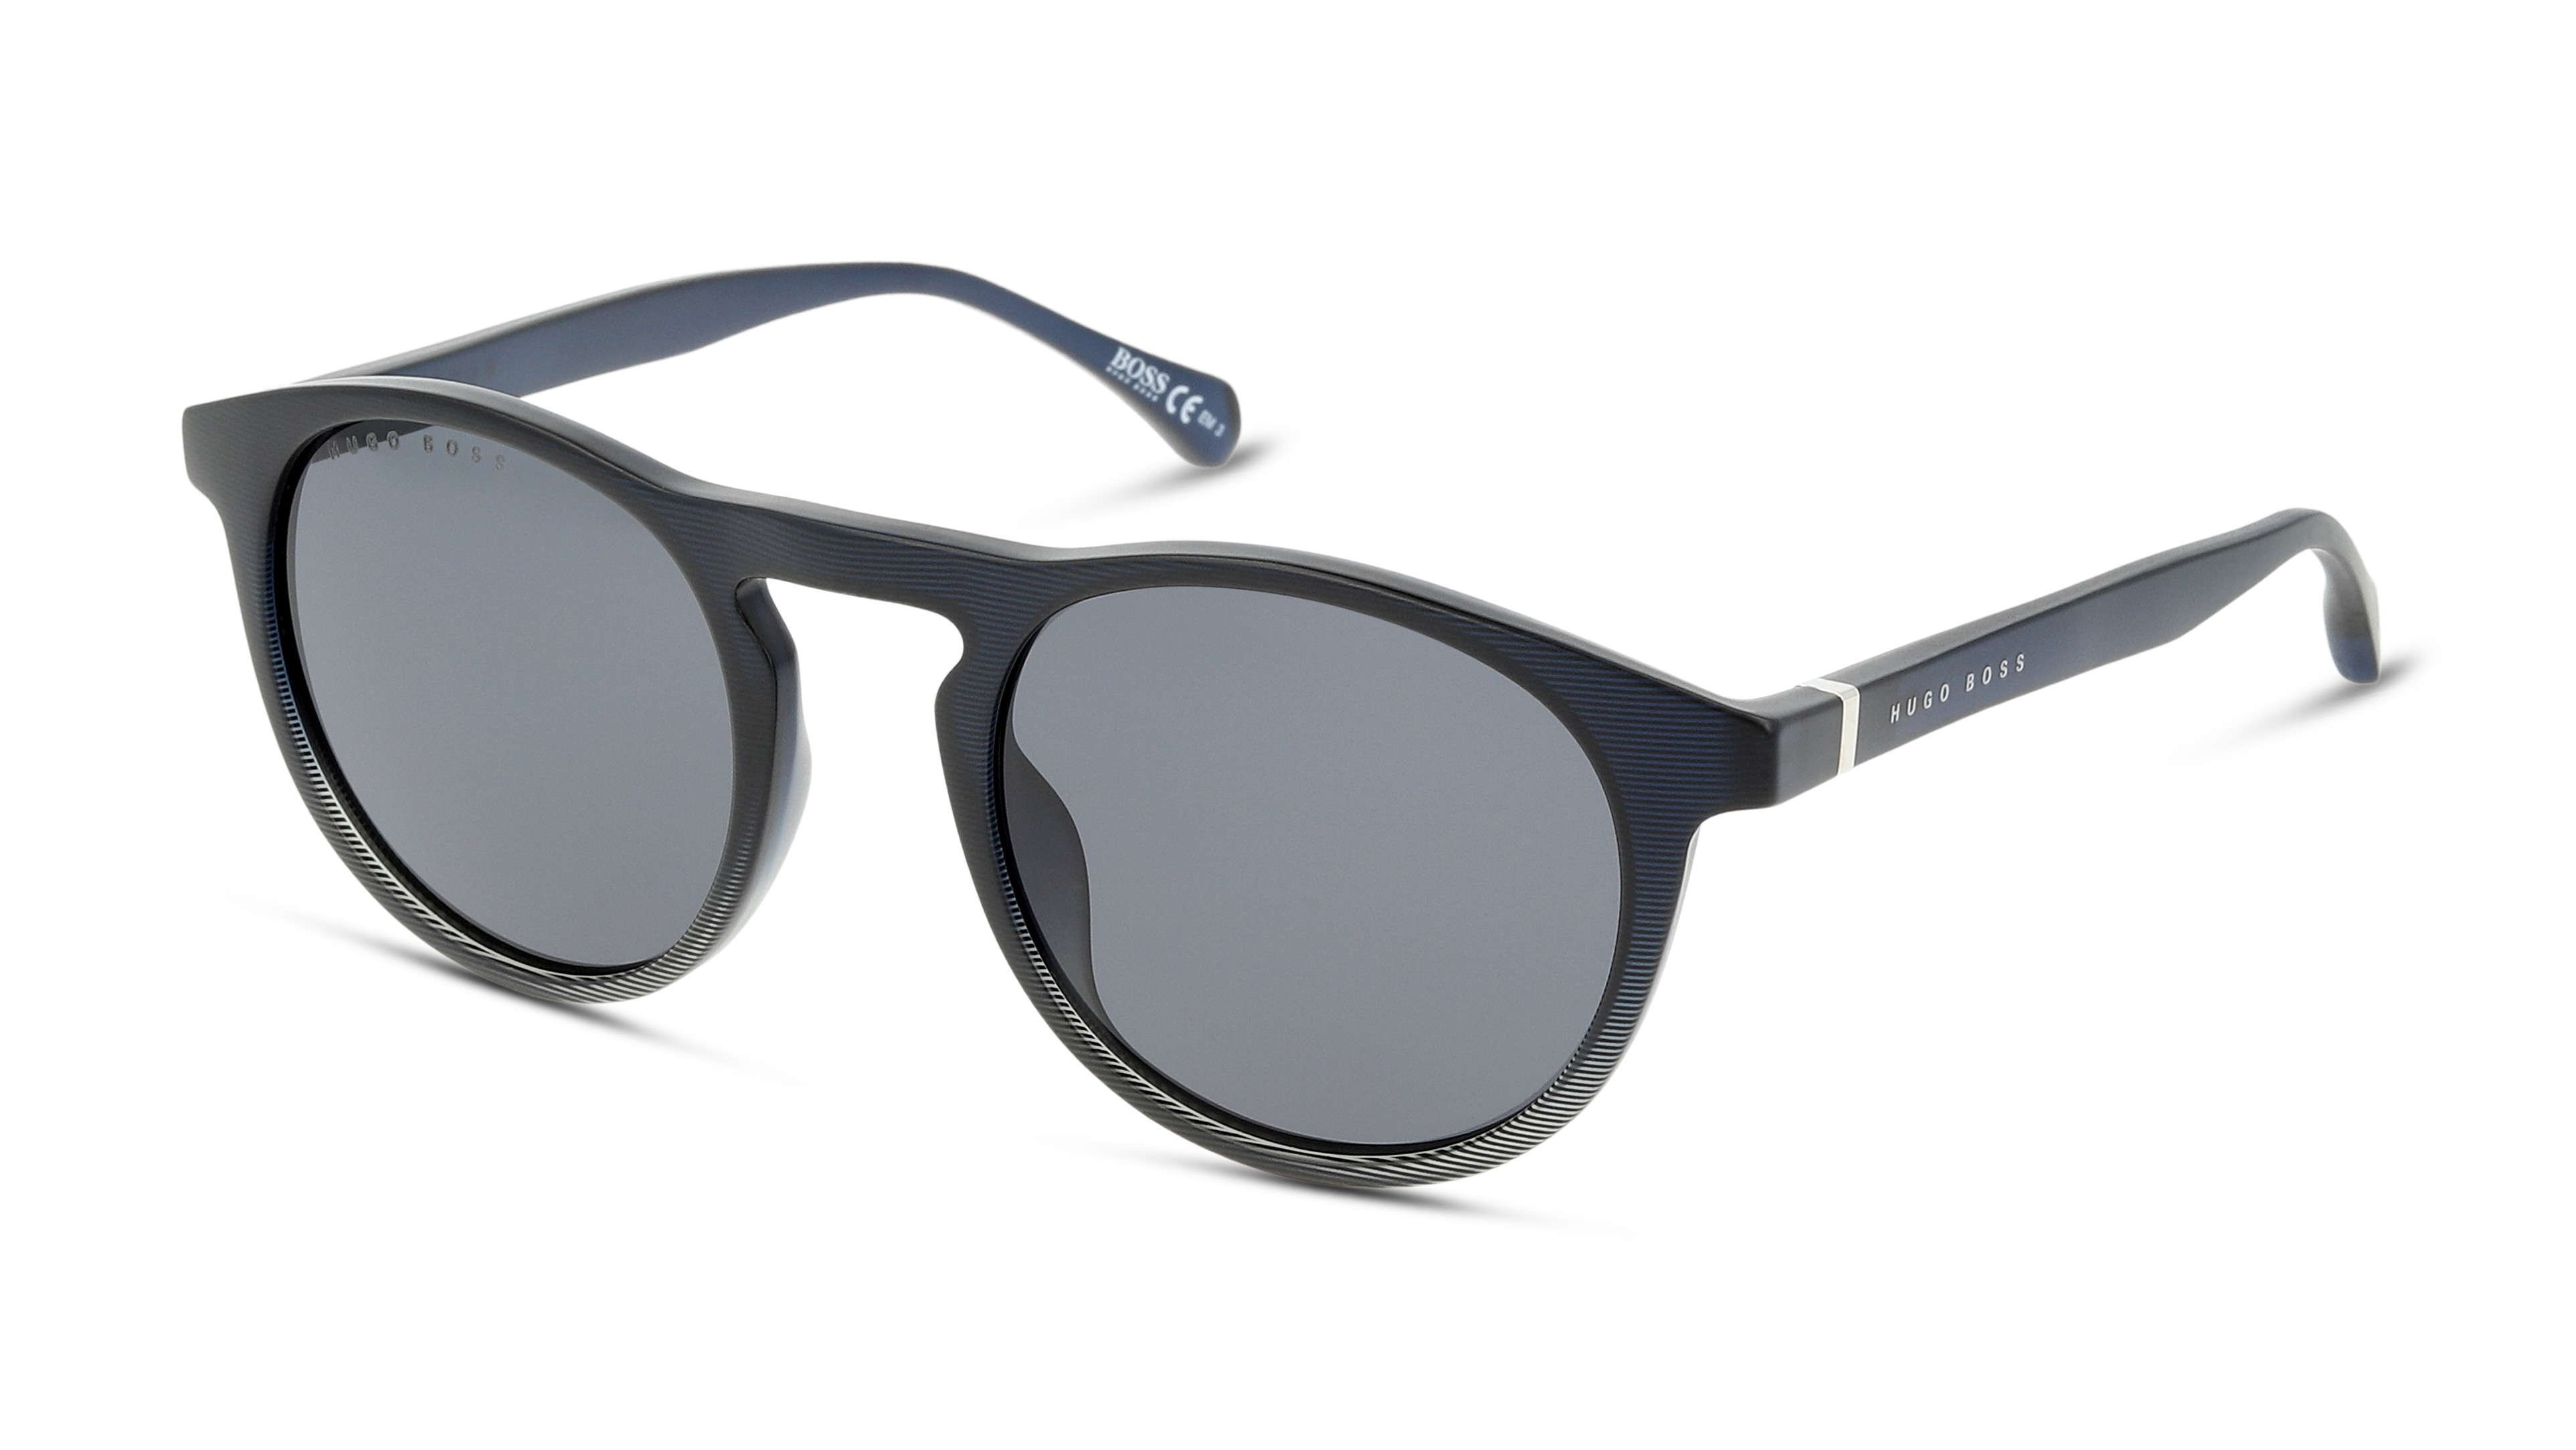 716736178950-angle-03-boss-boss-1083-s-eyewear-blue-patt